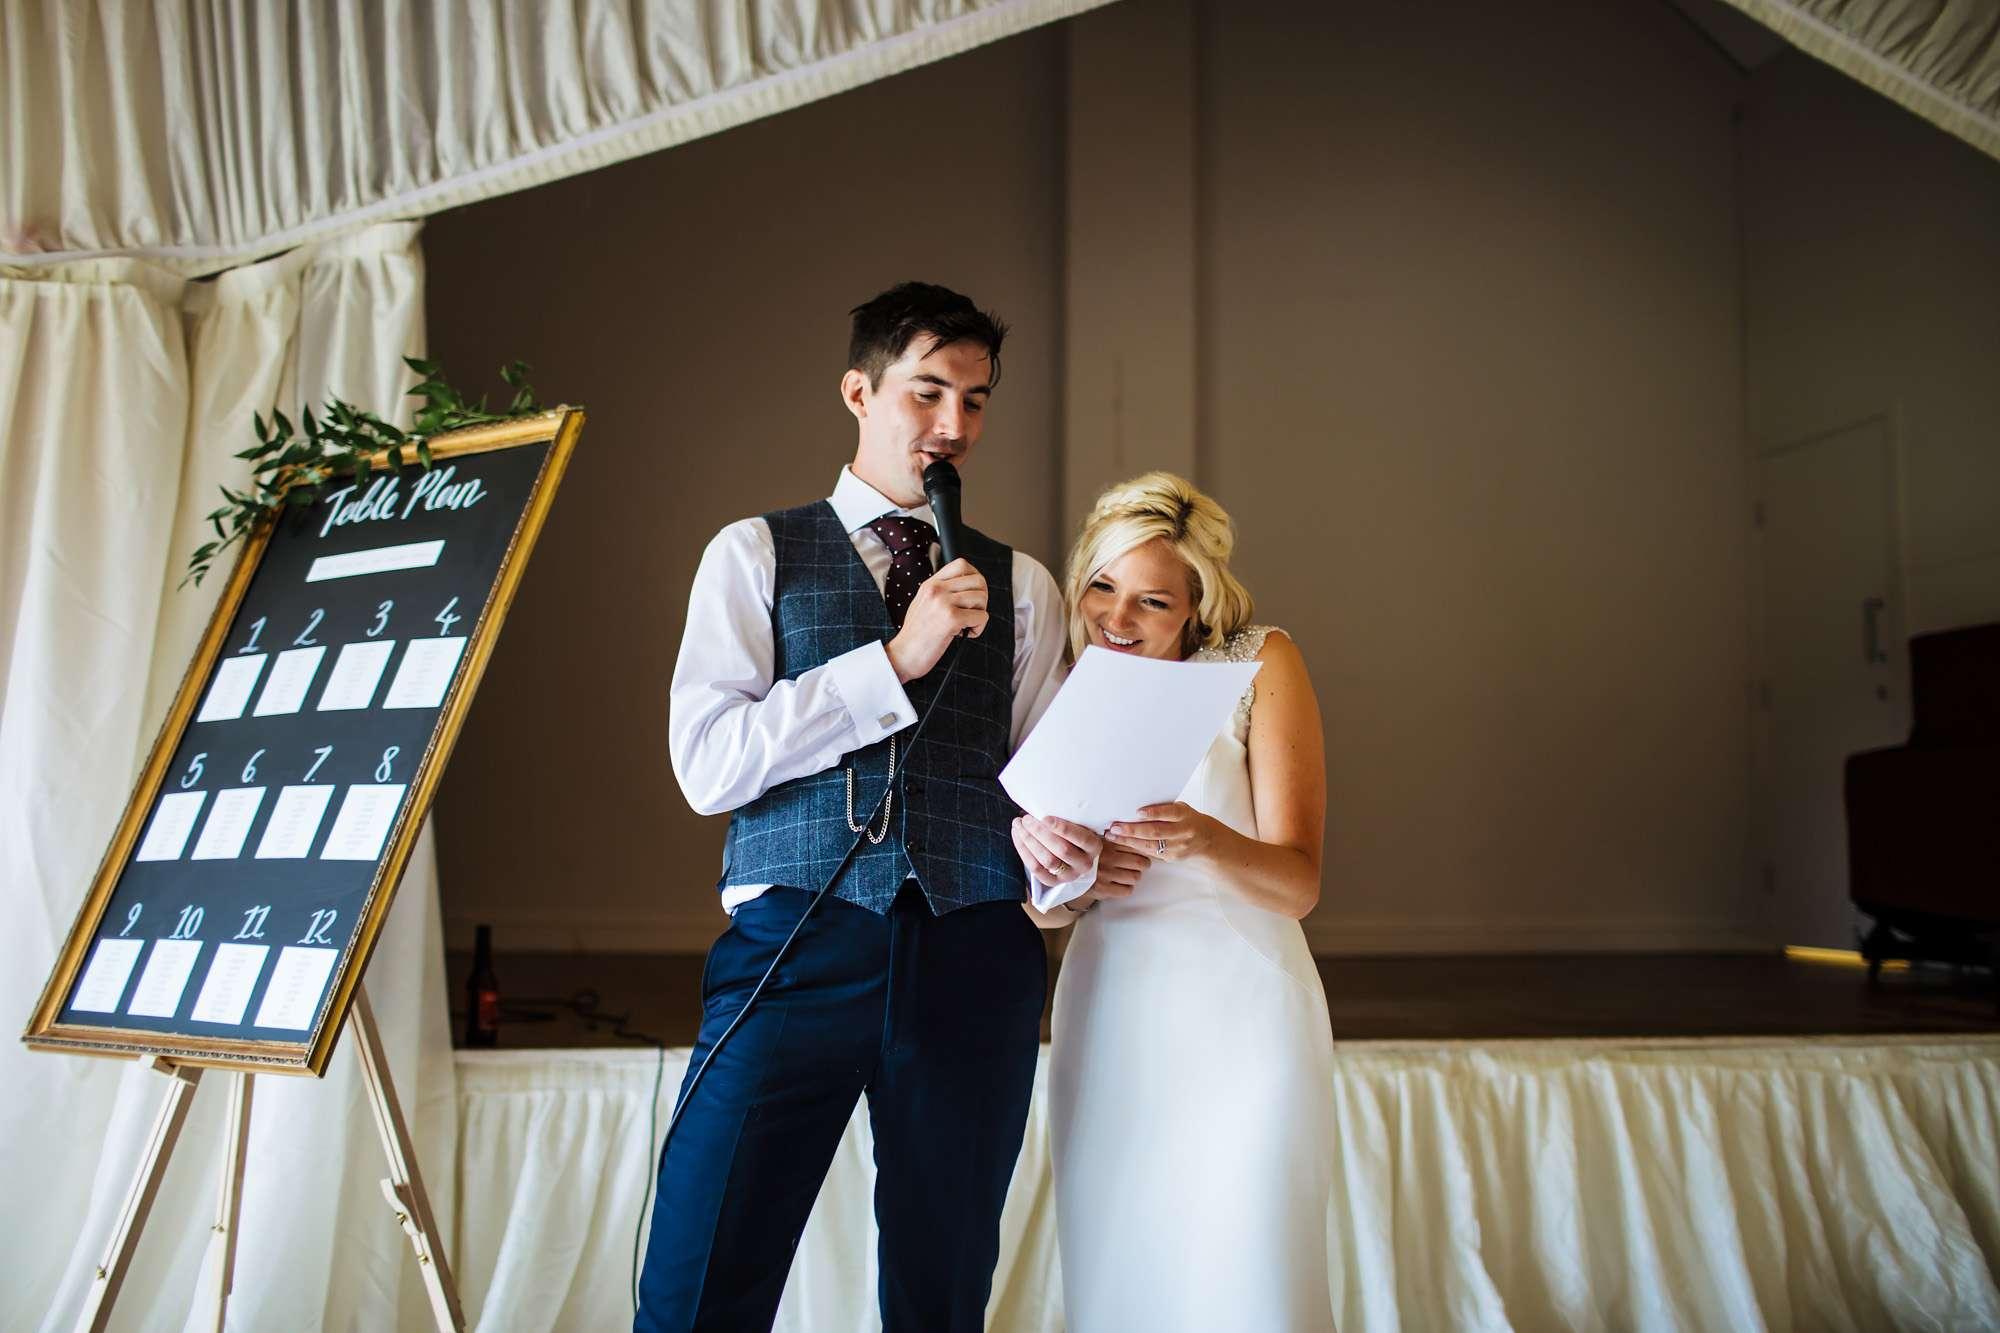 Bride and groom speech at East Keswick Village Hall wedding